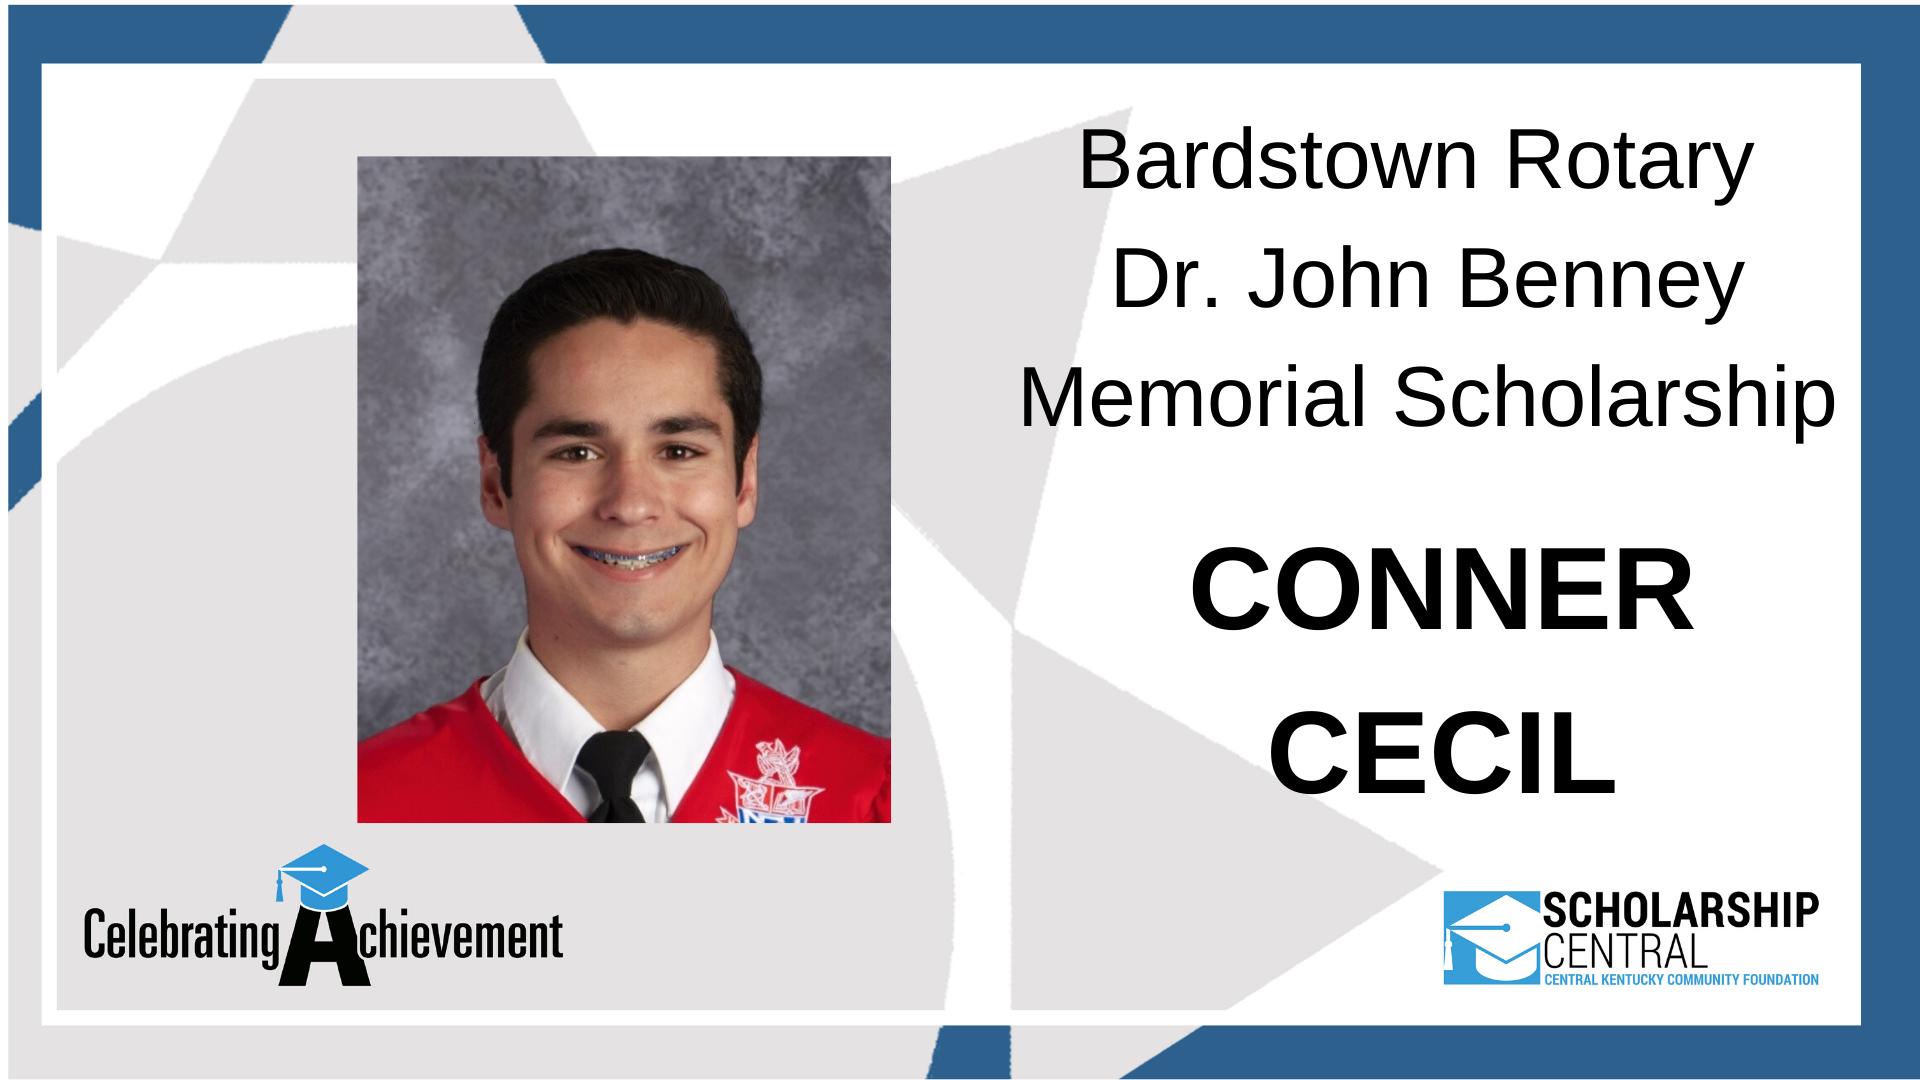 Bardstown Dr John Benney Scholarship